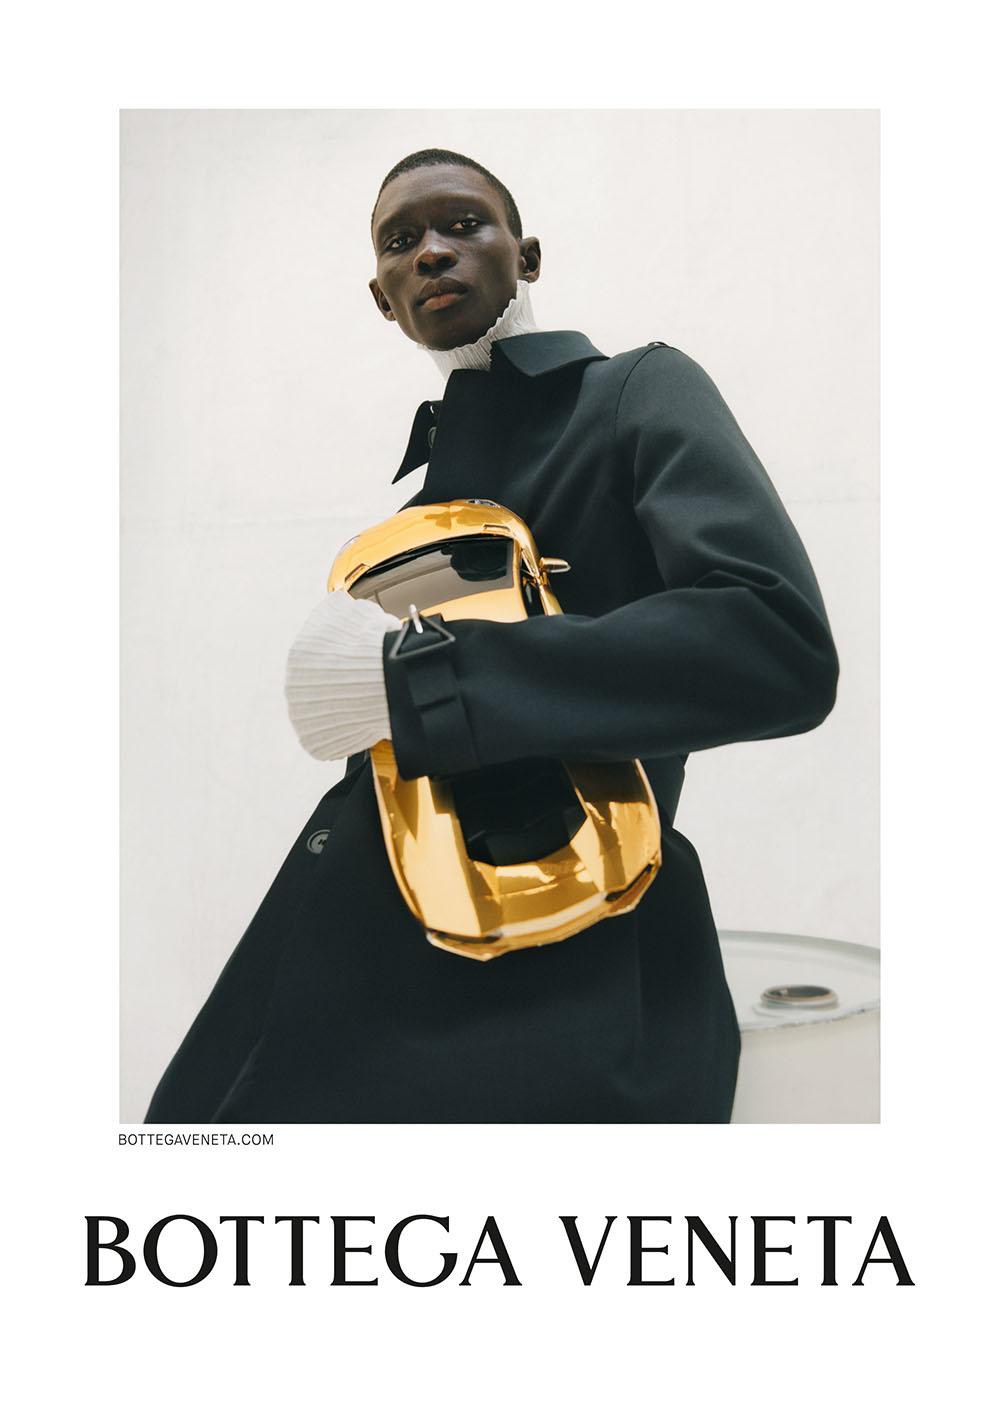 Bottega-Veneta-Fall-Winter-2019-Campaign-6.jpg